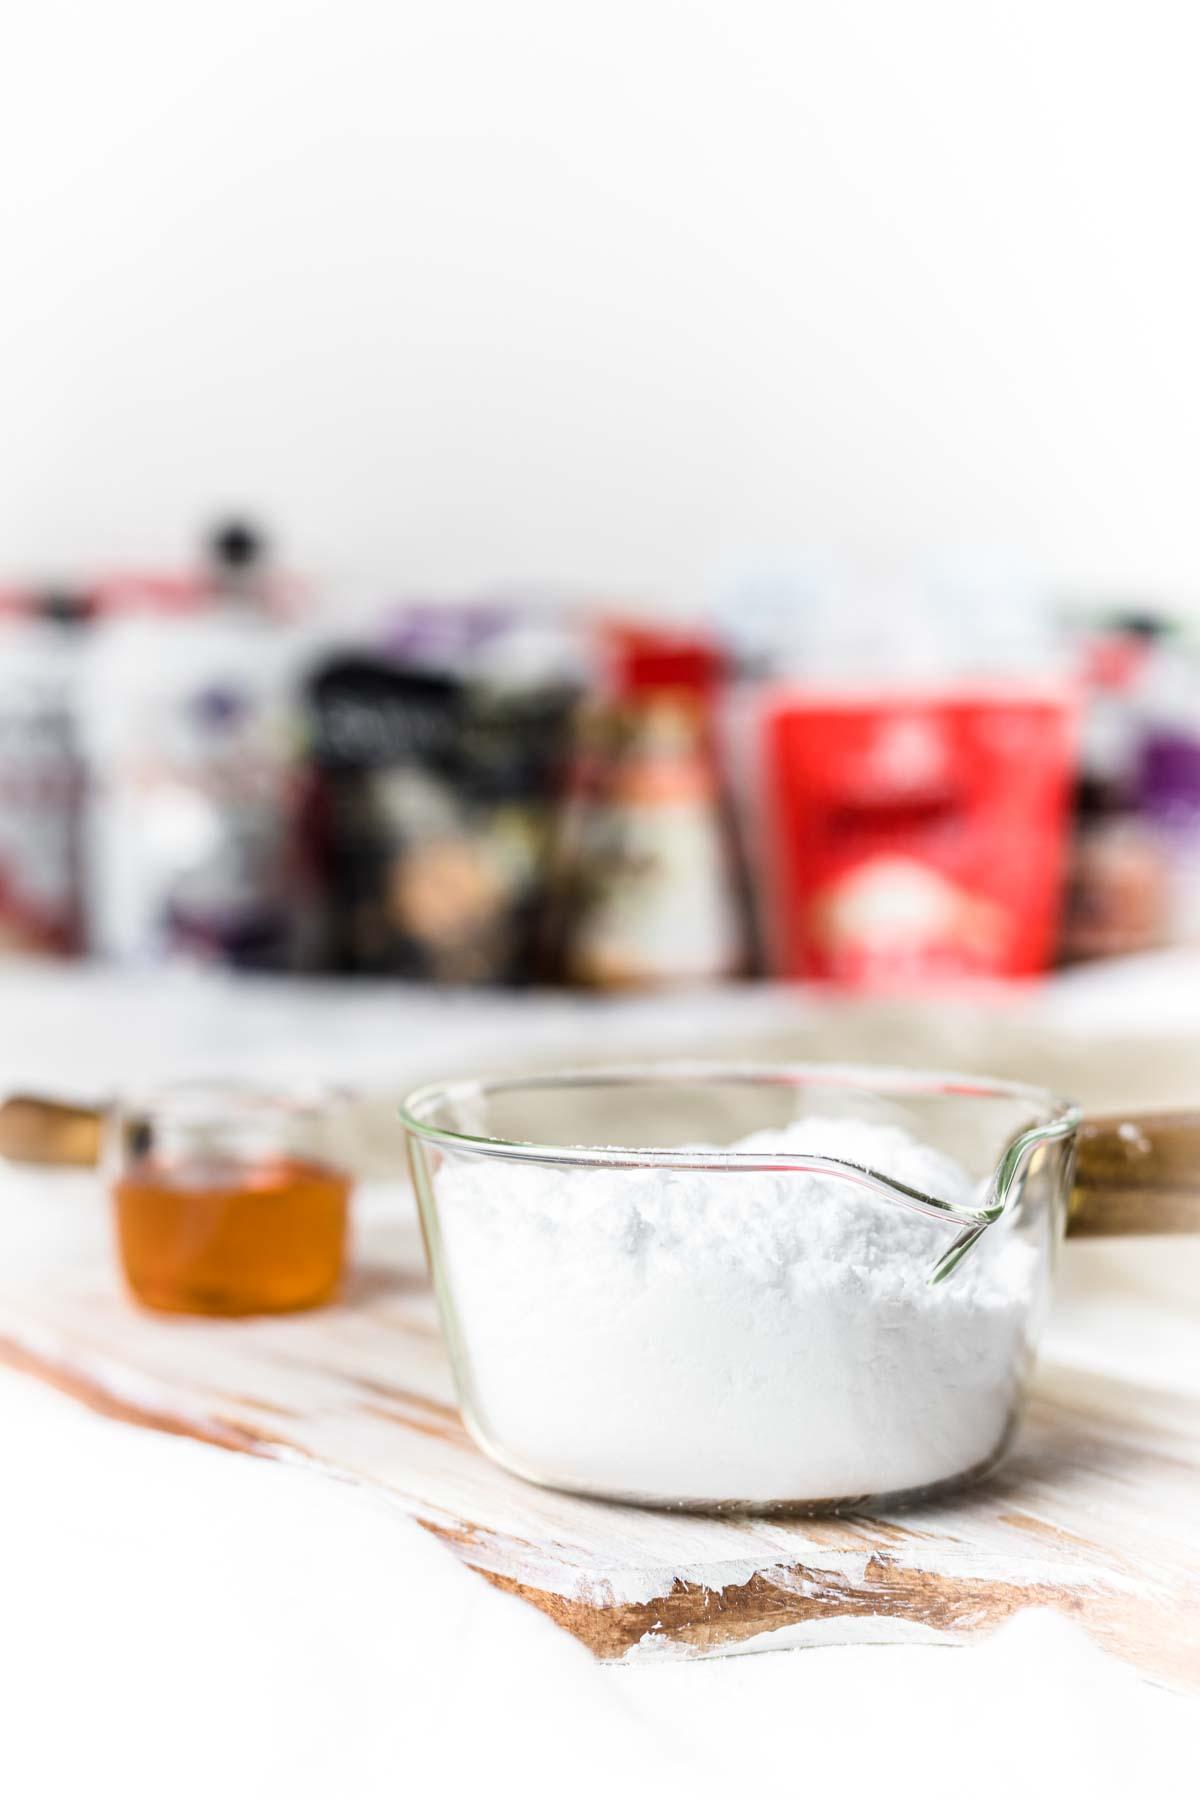 Sugar-Free Sugar coder and liquid